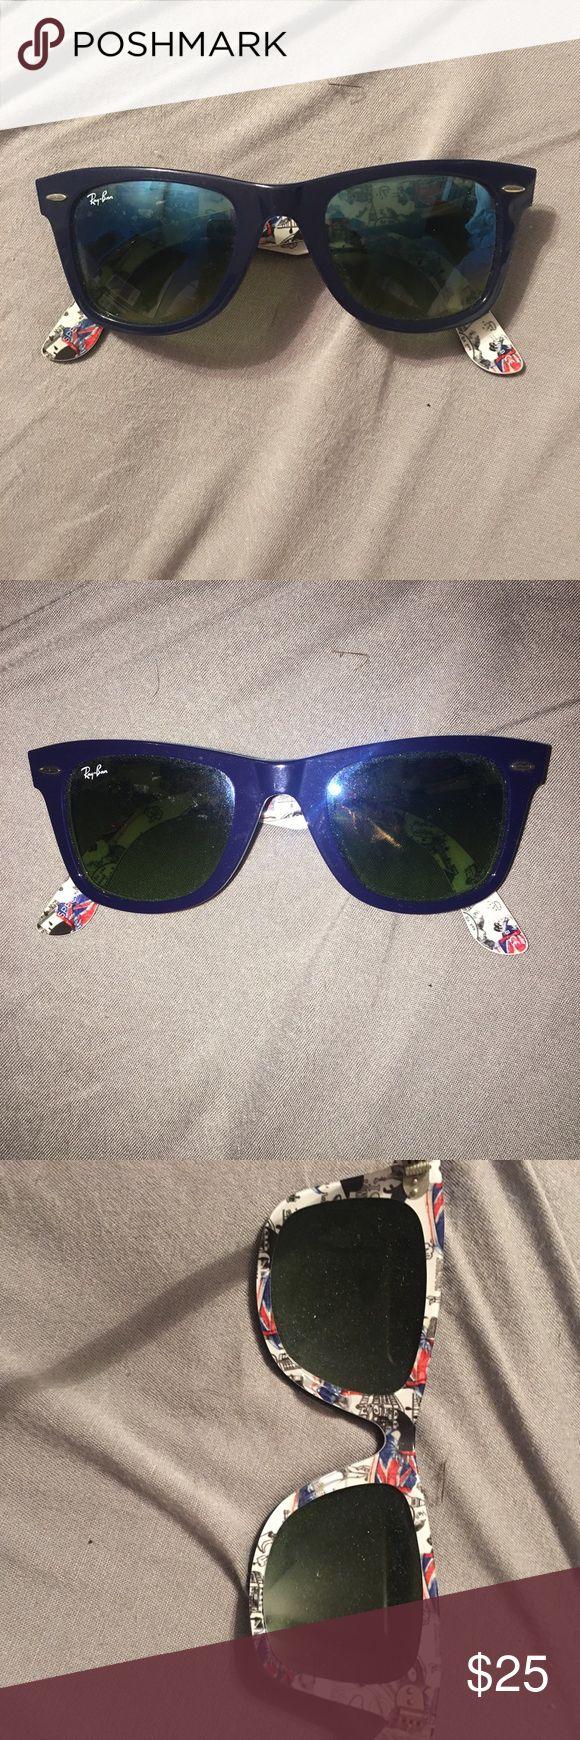 Ray Ban Wayfarer Navy blue ray ban wayfarers with a British pattern on the inside interior Ray-Ban Accessories Sunglasses